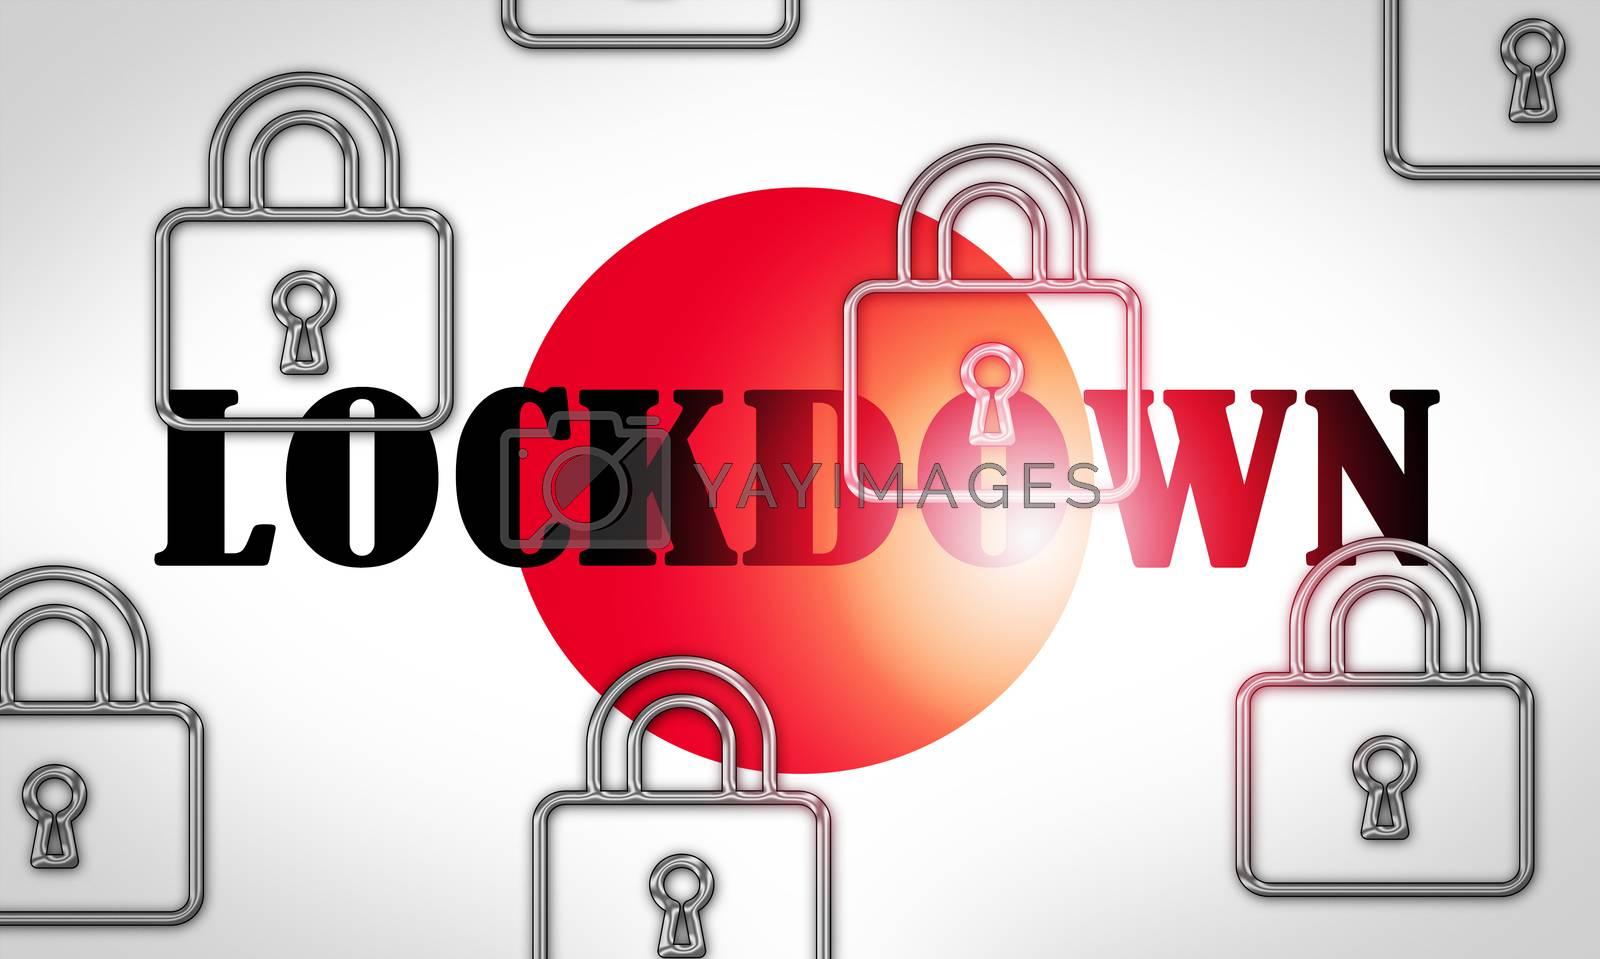 Japan lockdown slowing ncov epidemic or outbreak - 3d Illustrati by stuartmiles